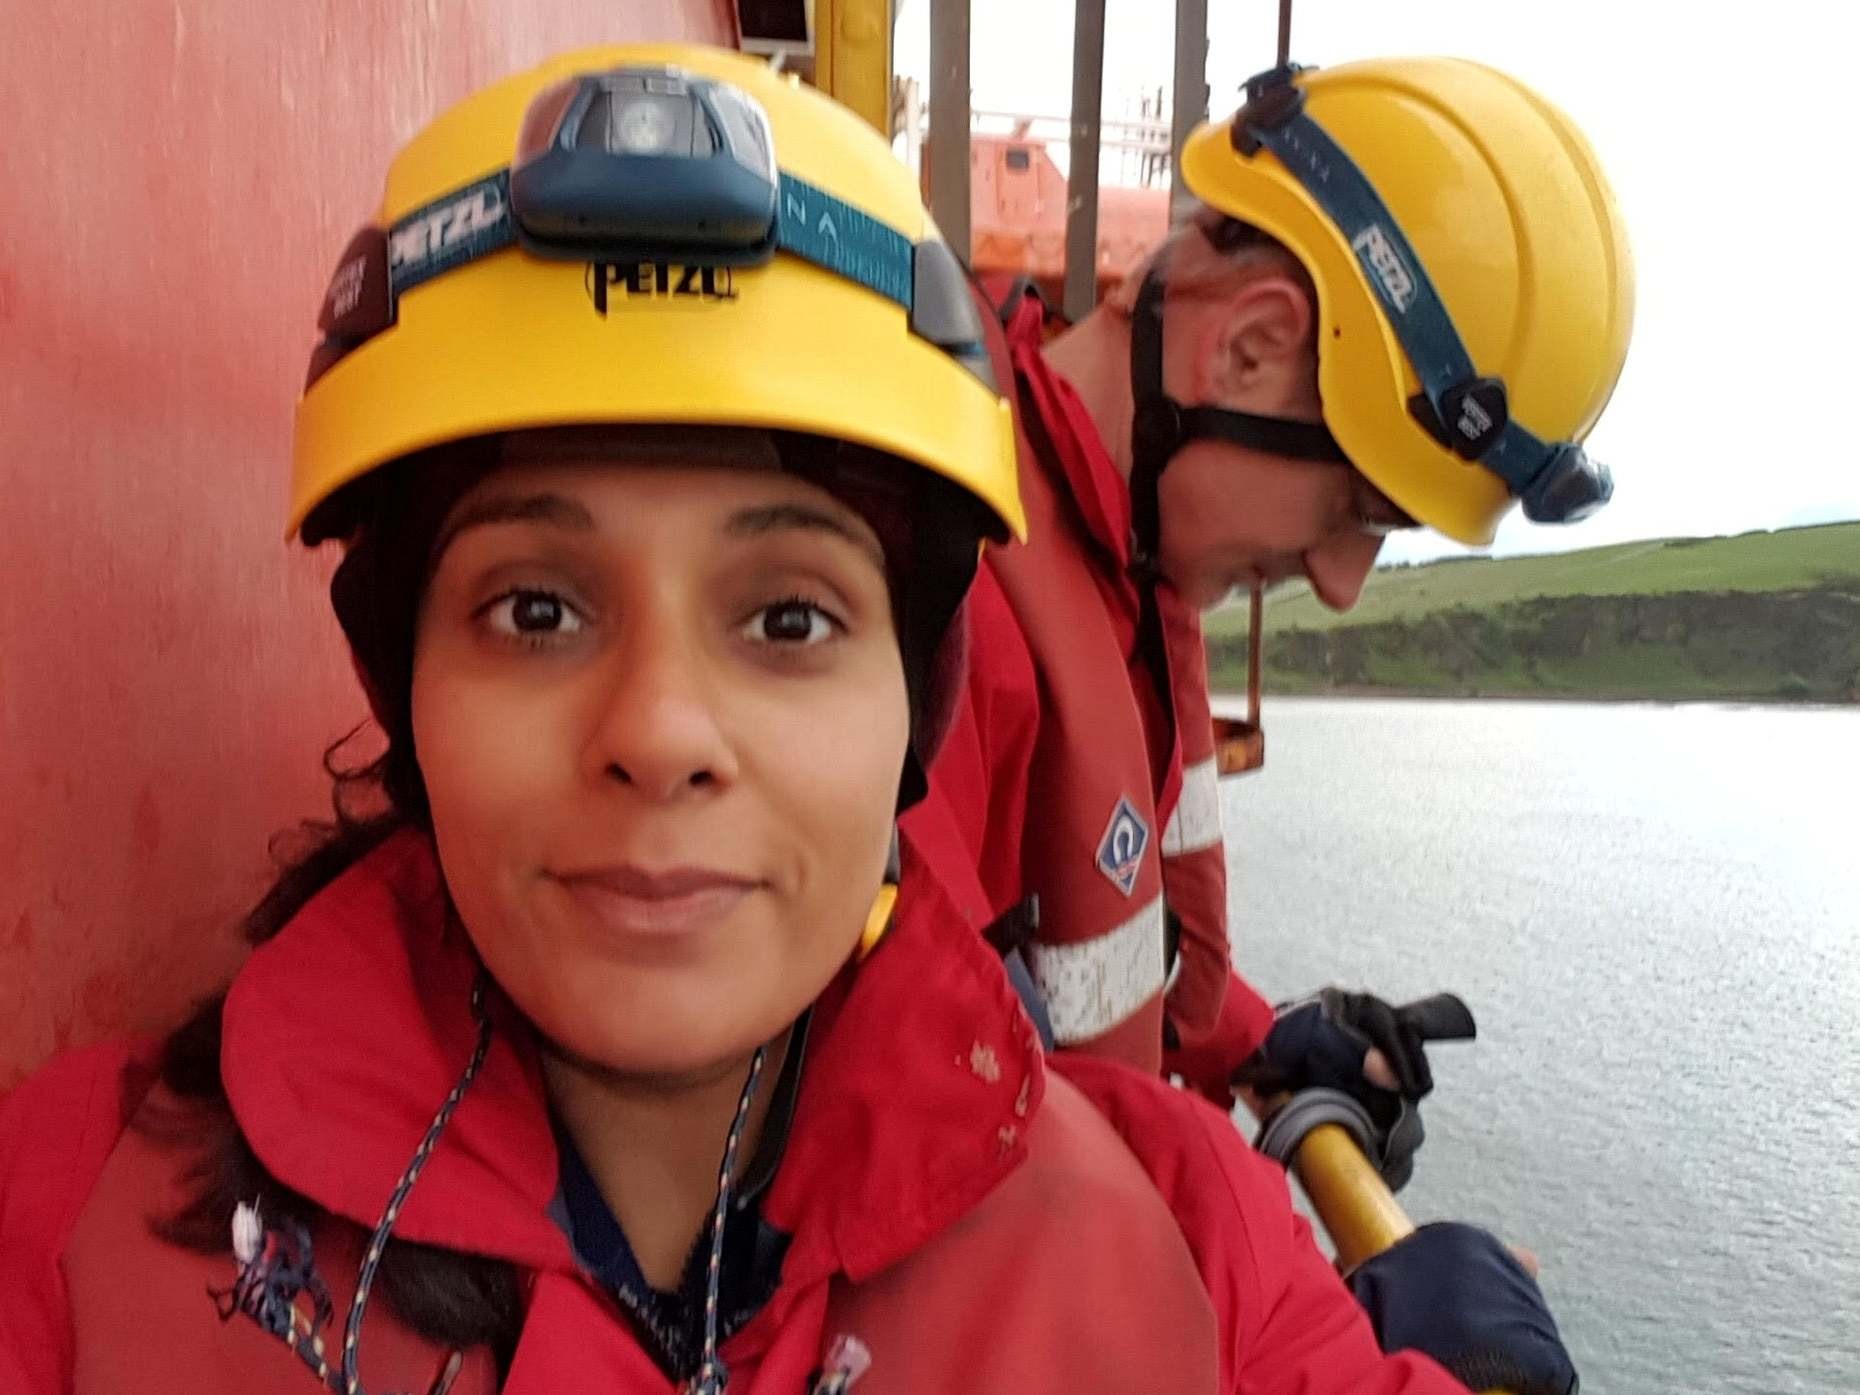 Greenpeace activists vow to continue battle over BP oil rig, despite arrests